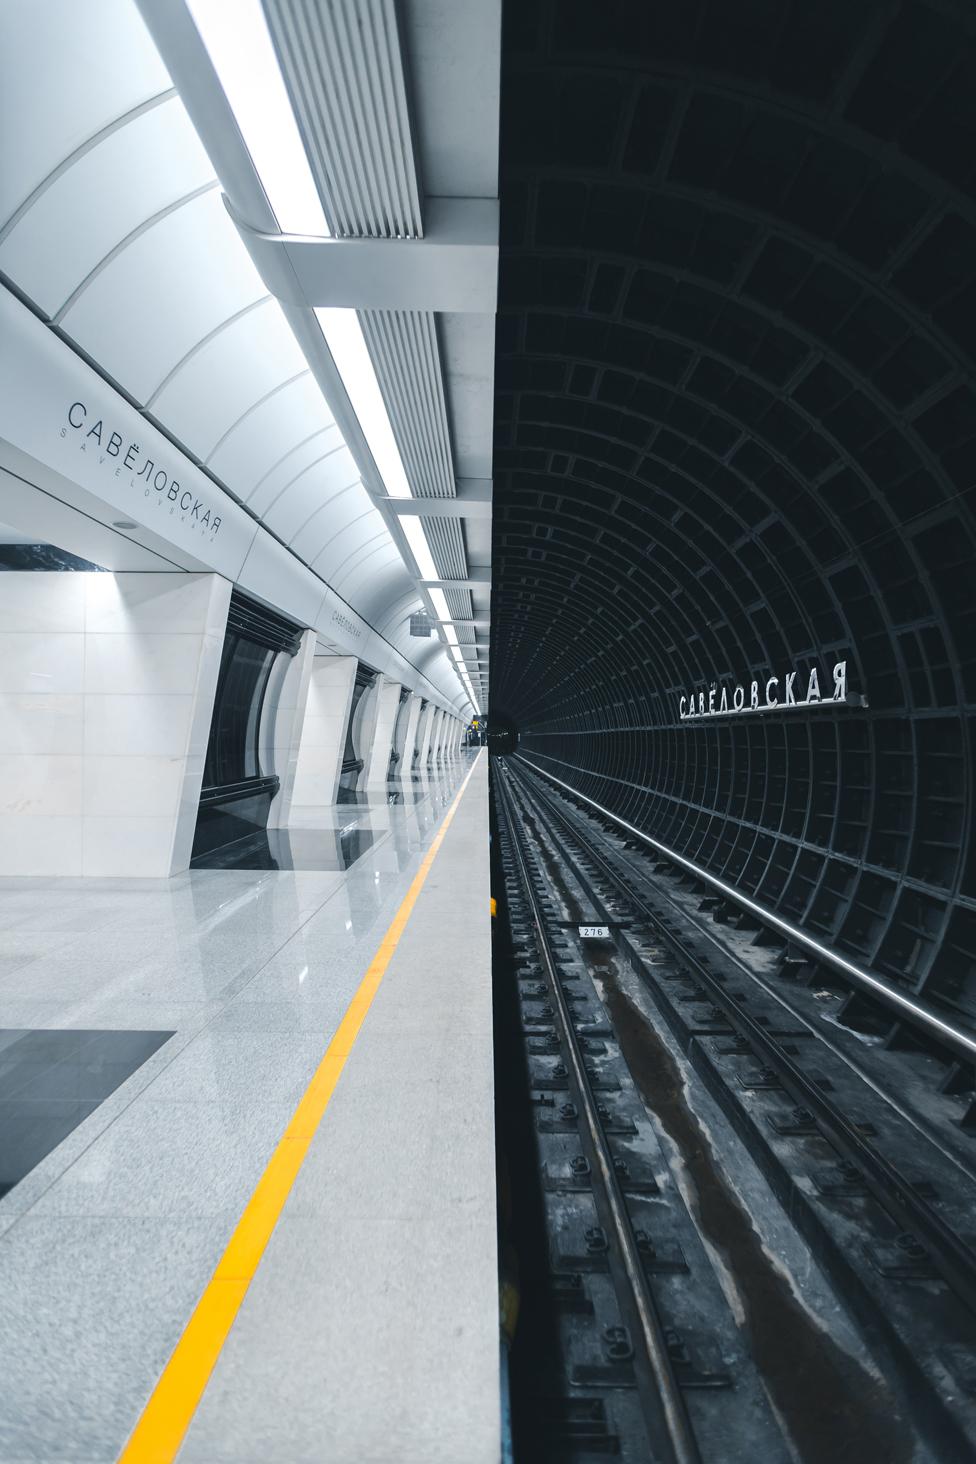 Metrostation por Alexandr Bormotin, Moscú, Rusia.